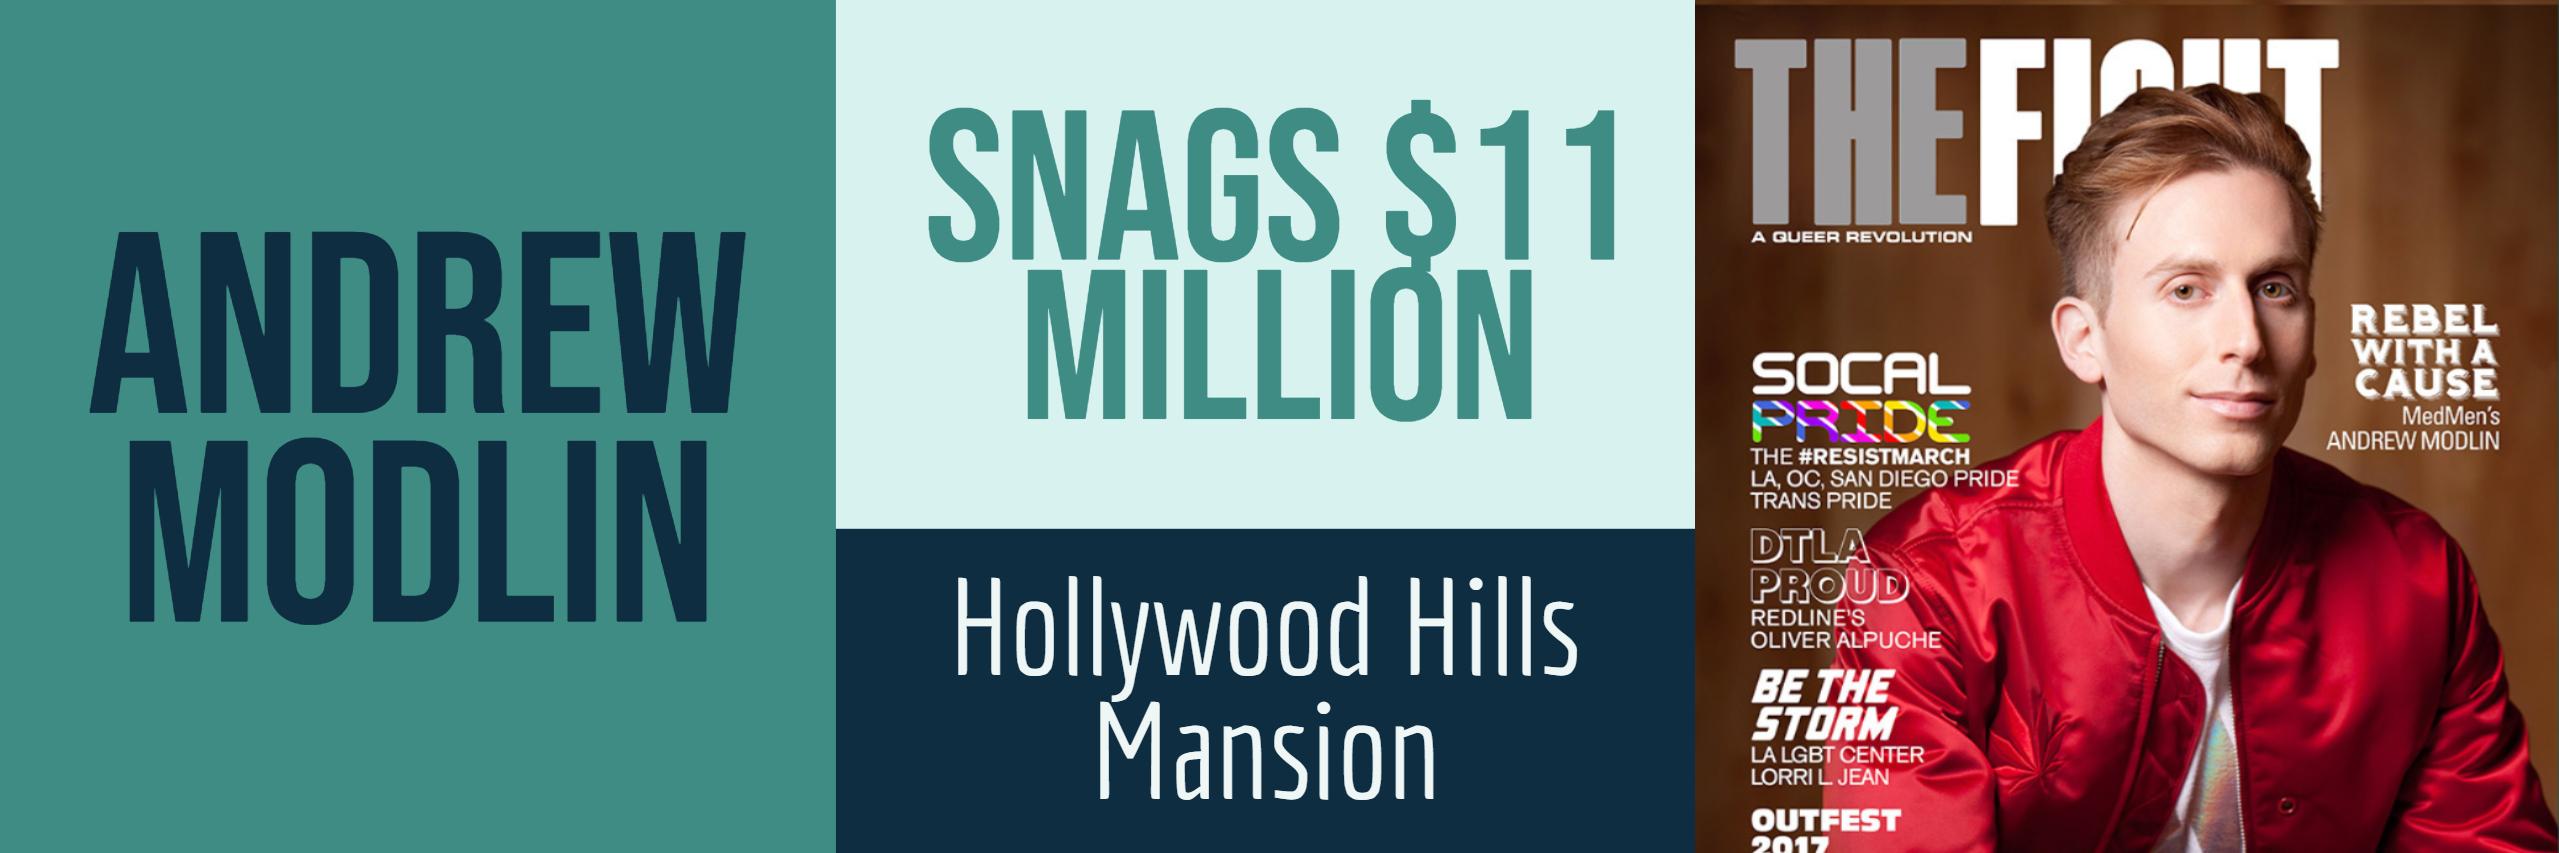 Andrew Modlin Snags $11 Million Hollywood Hills Mansion